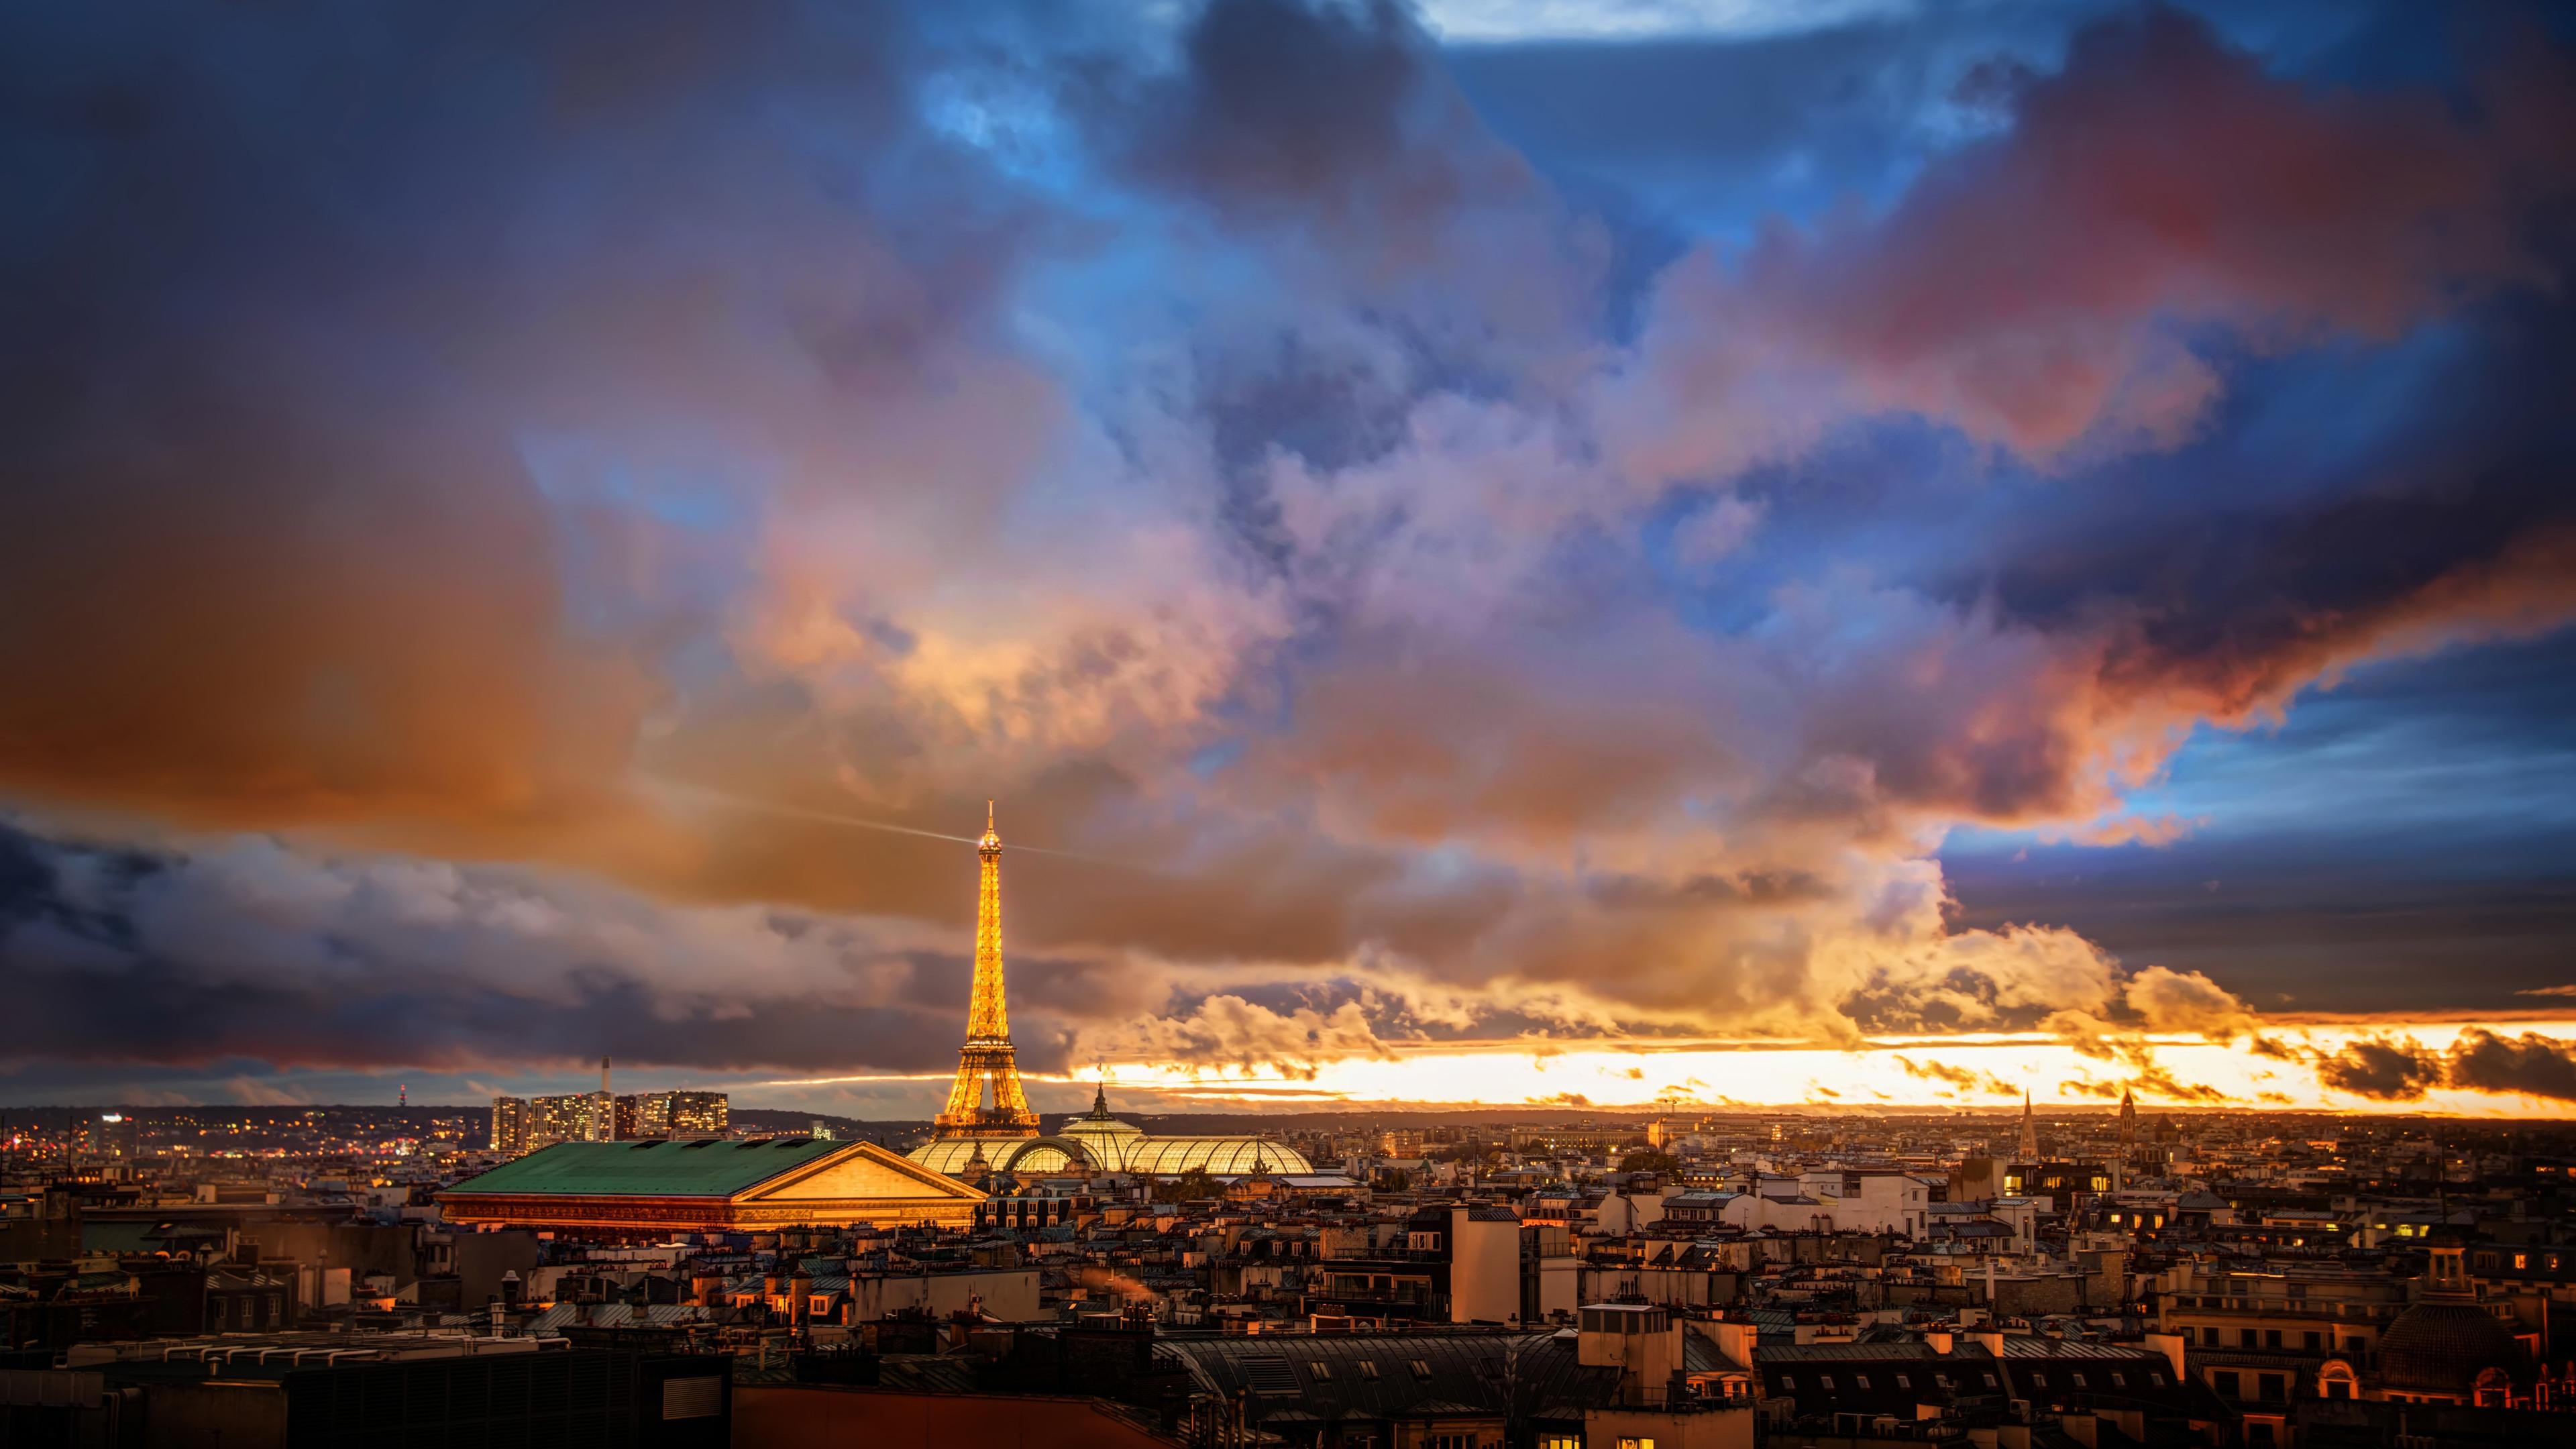 sunset over paris 1538069233 - Sunset Over Paris - world wallpapers, sunset wallpapers, photography wallpapers, paris wallpapers, hd-wallpapers, 8k wallpapers, 5k wallpapers, 4k-wallpapers